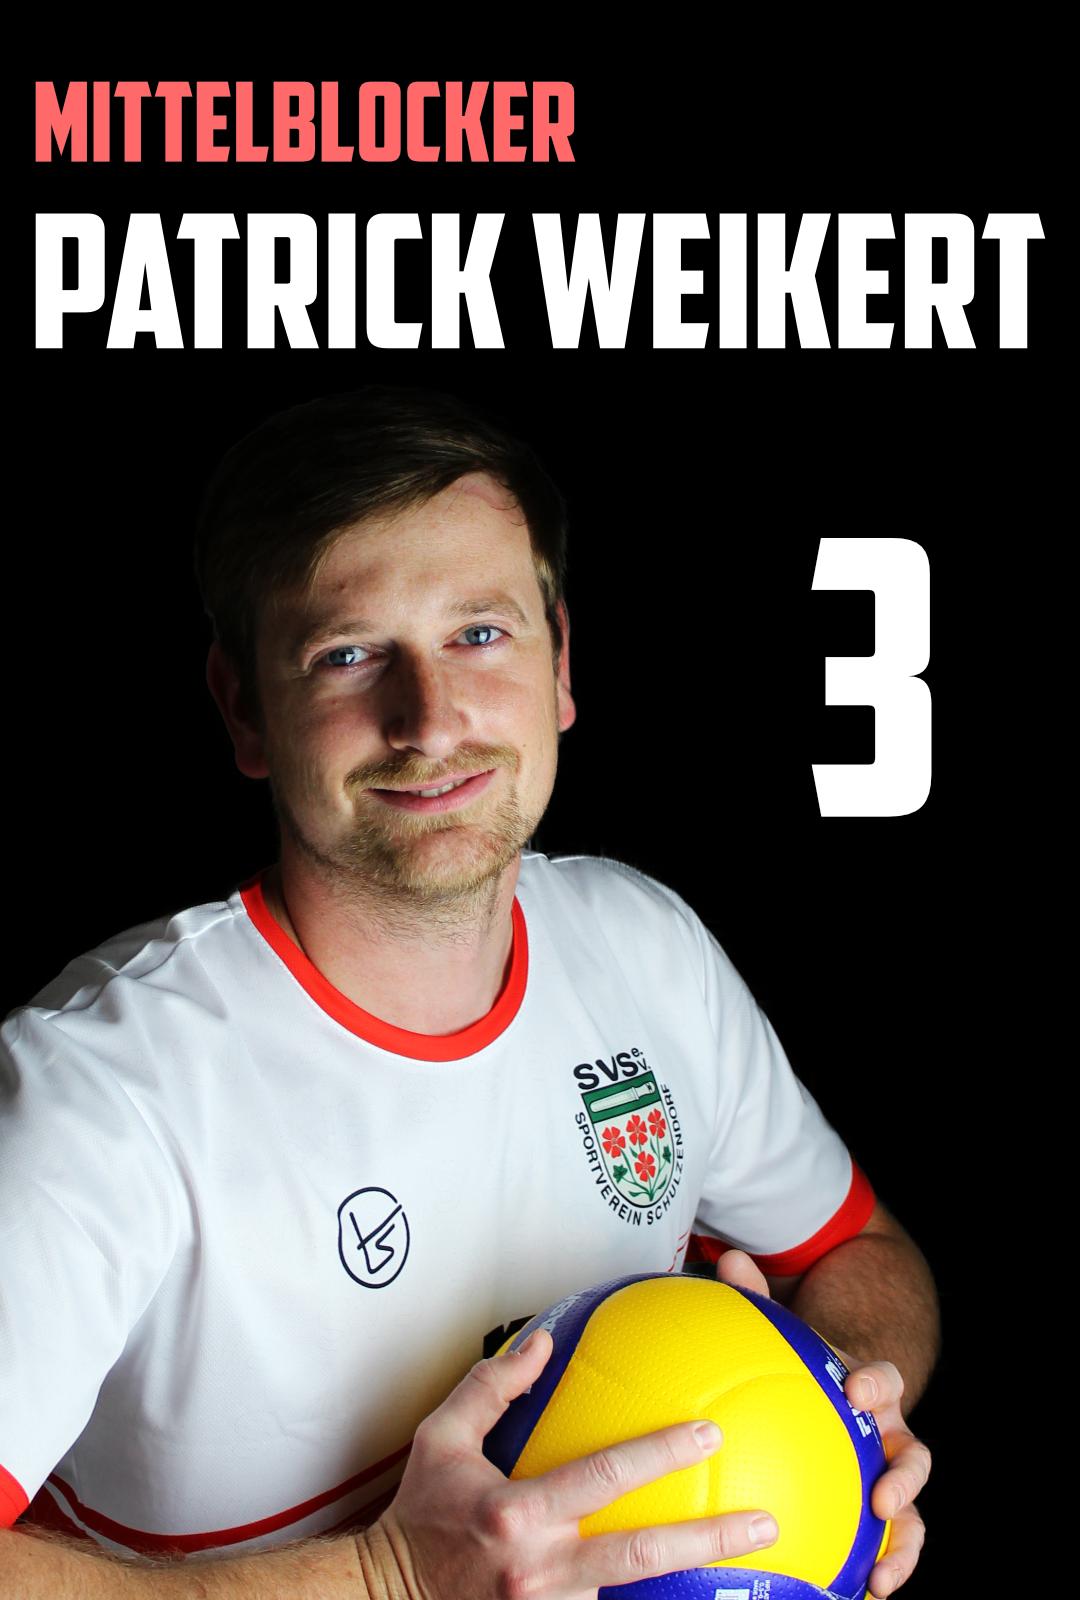 Patrick Weikert